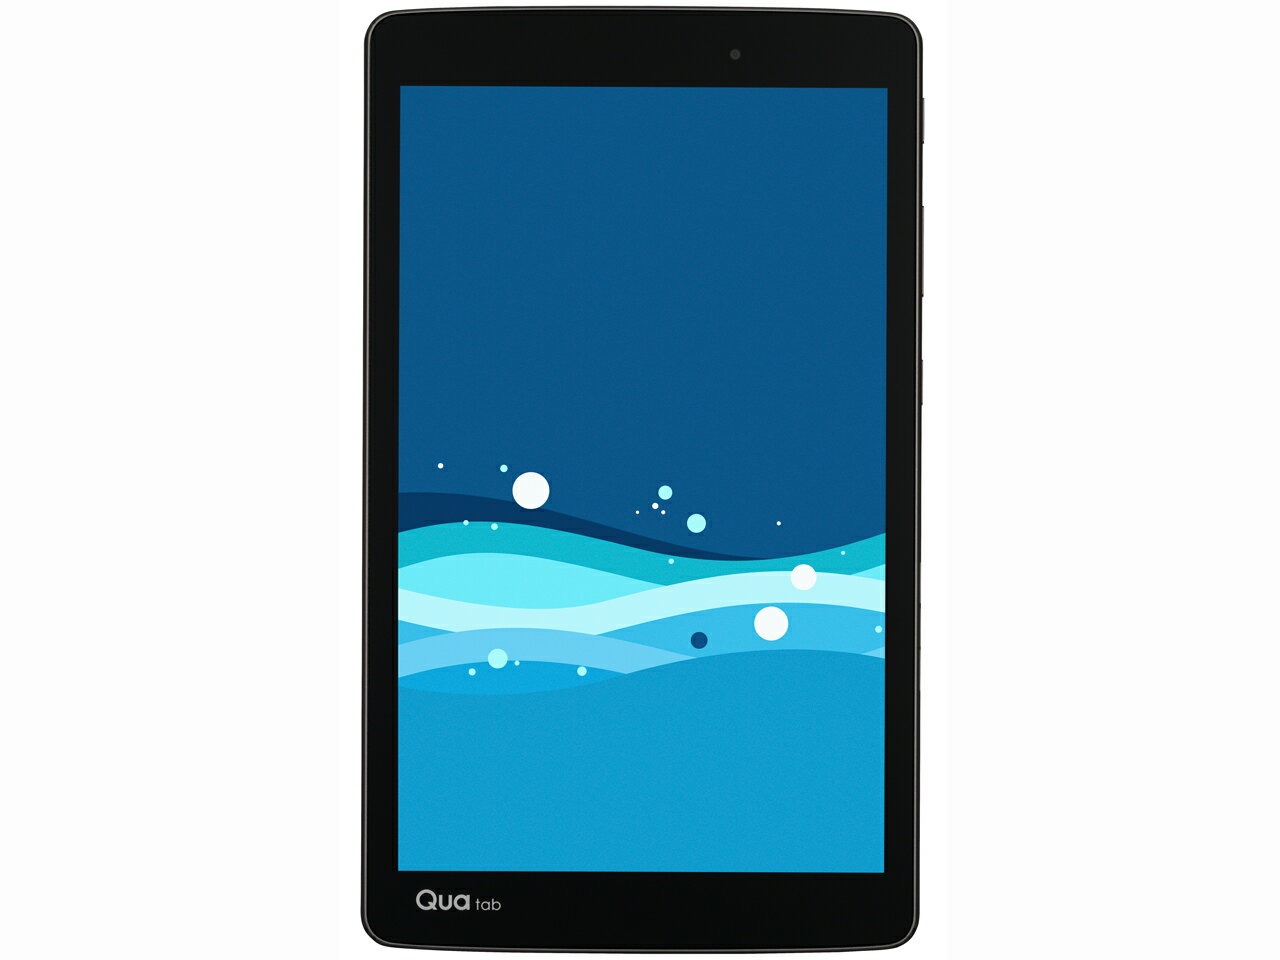 LGエレクトロニクス Qua tab PX au [ネイビー] キュアタブ 白ロム 8.0型WUXGA液晶を搭載した格安タブレット